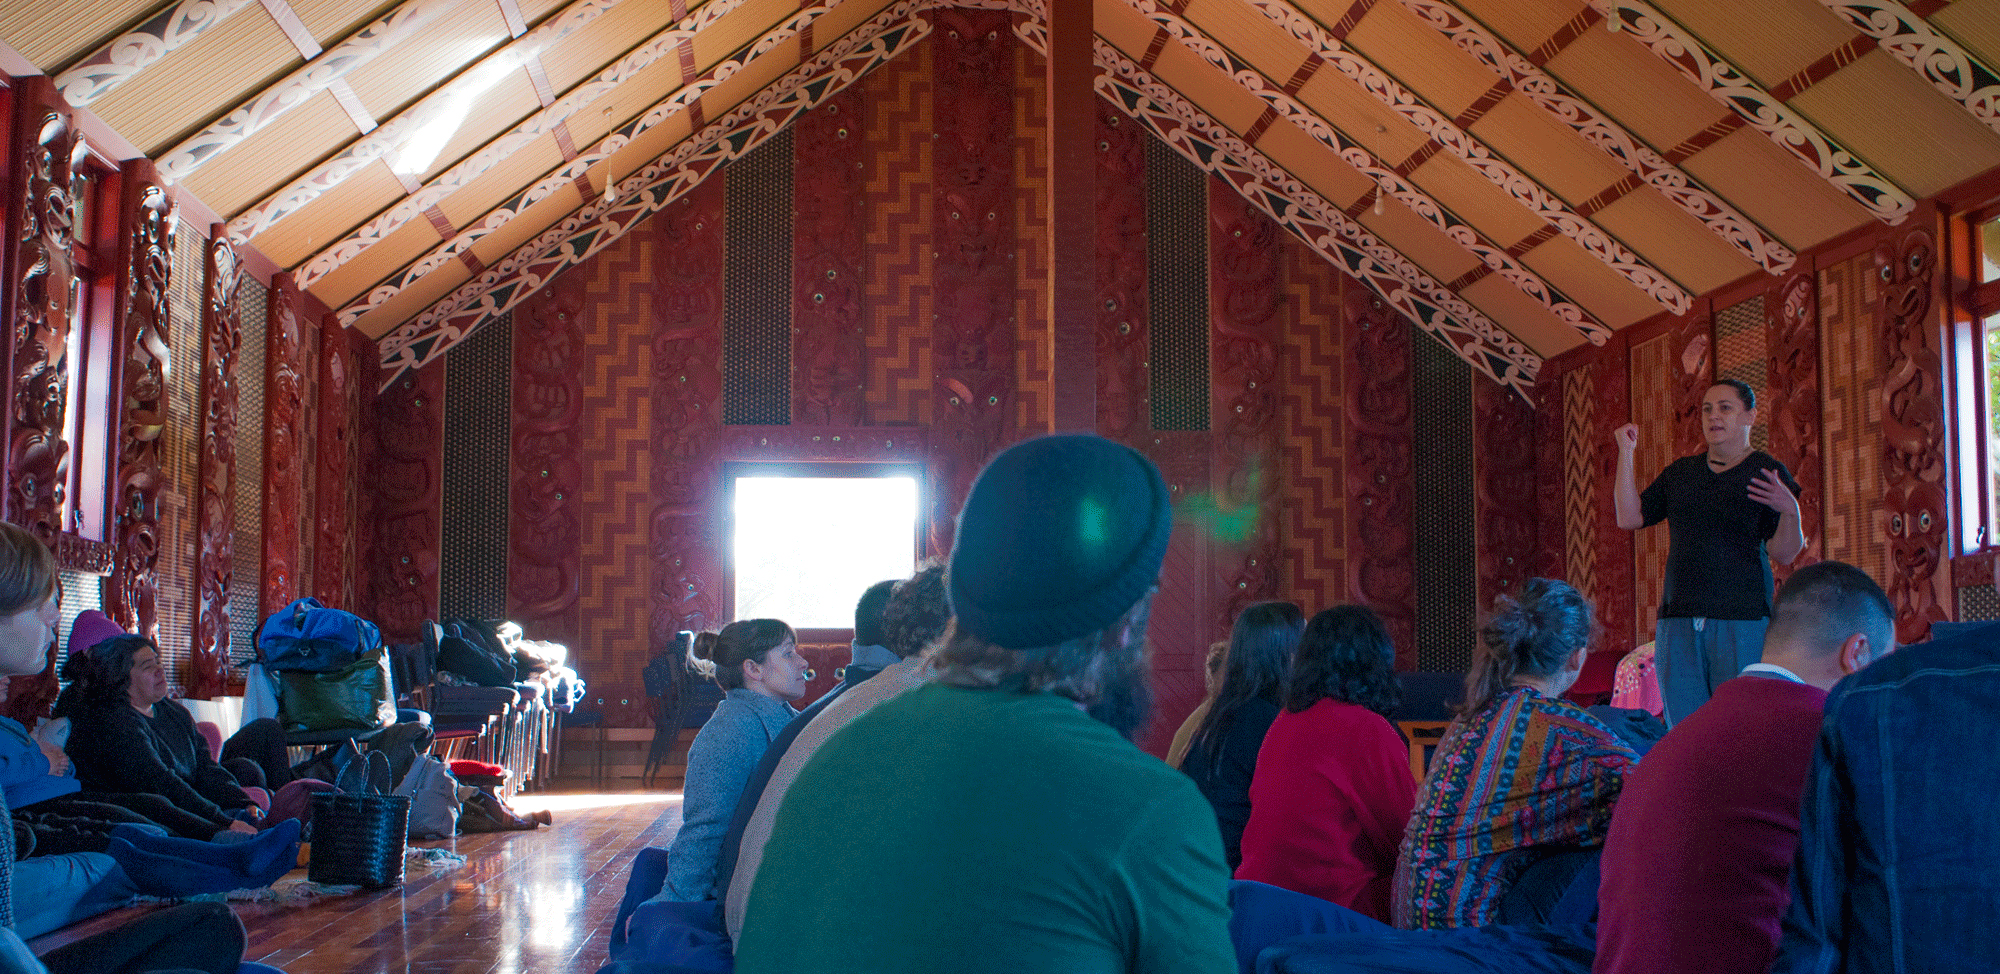 2016 Symposium, Desna Whaanga-Schollum at Hoani Waititi Marae. Photo Ziggy Lever